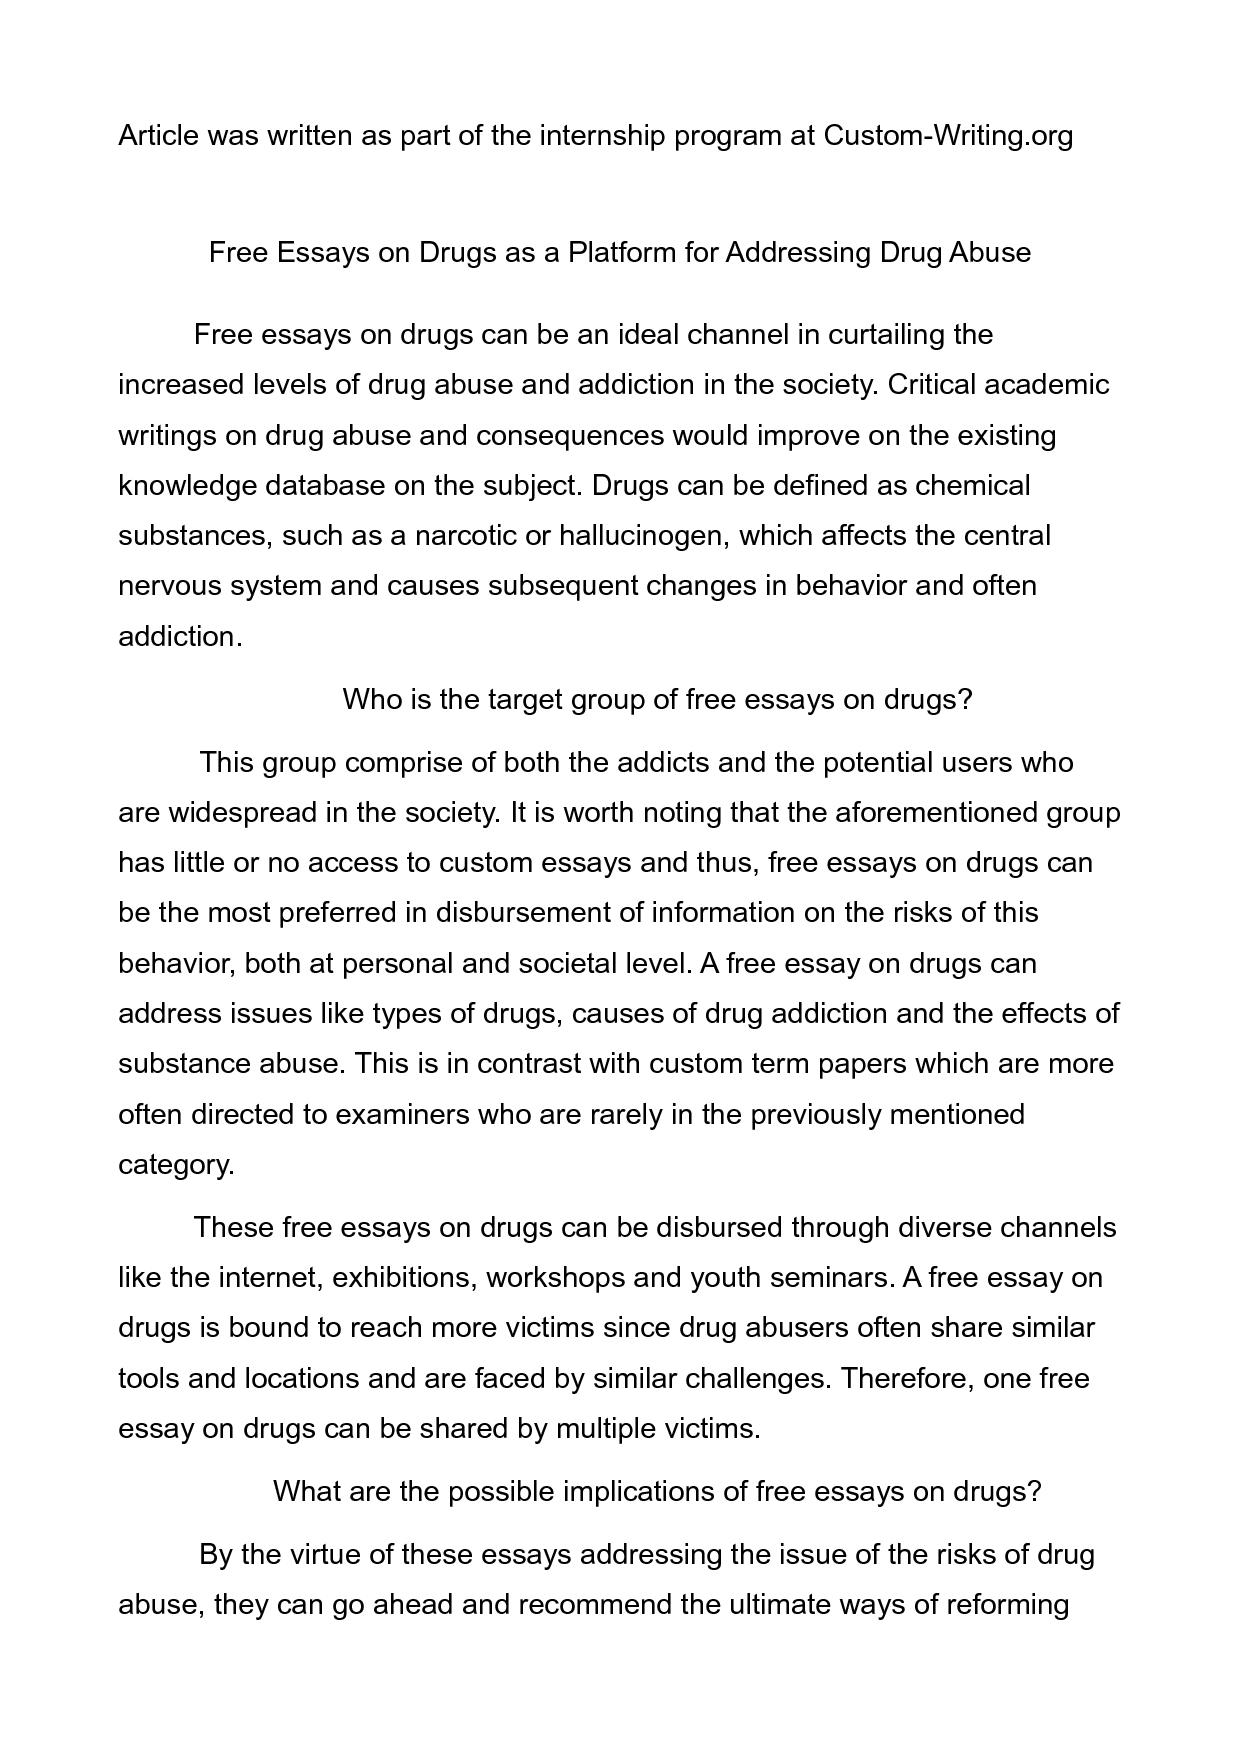 001 Essays About Drugs Essay Stirring Short Tagalog Persuasive Illegal Argumentative Addiction Full